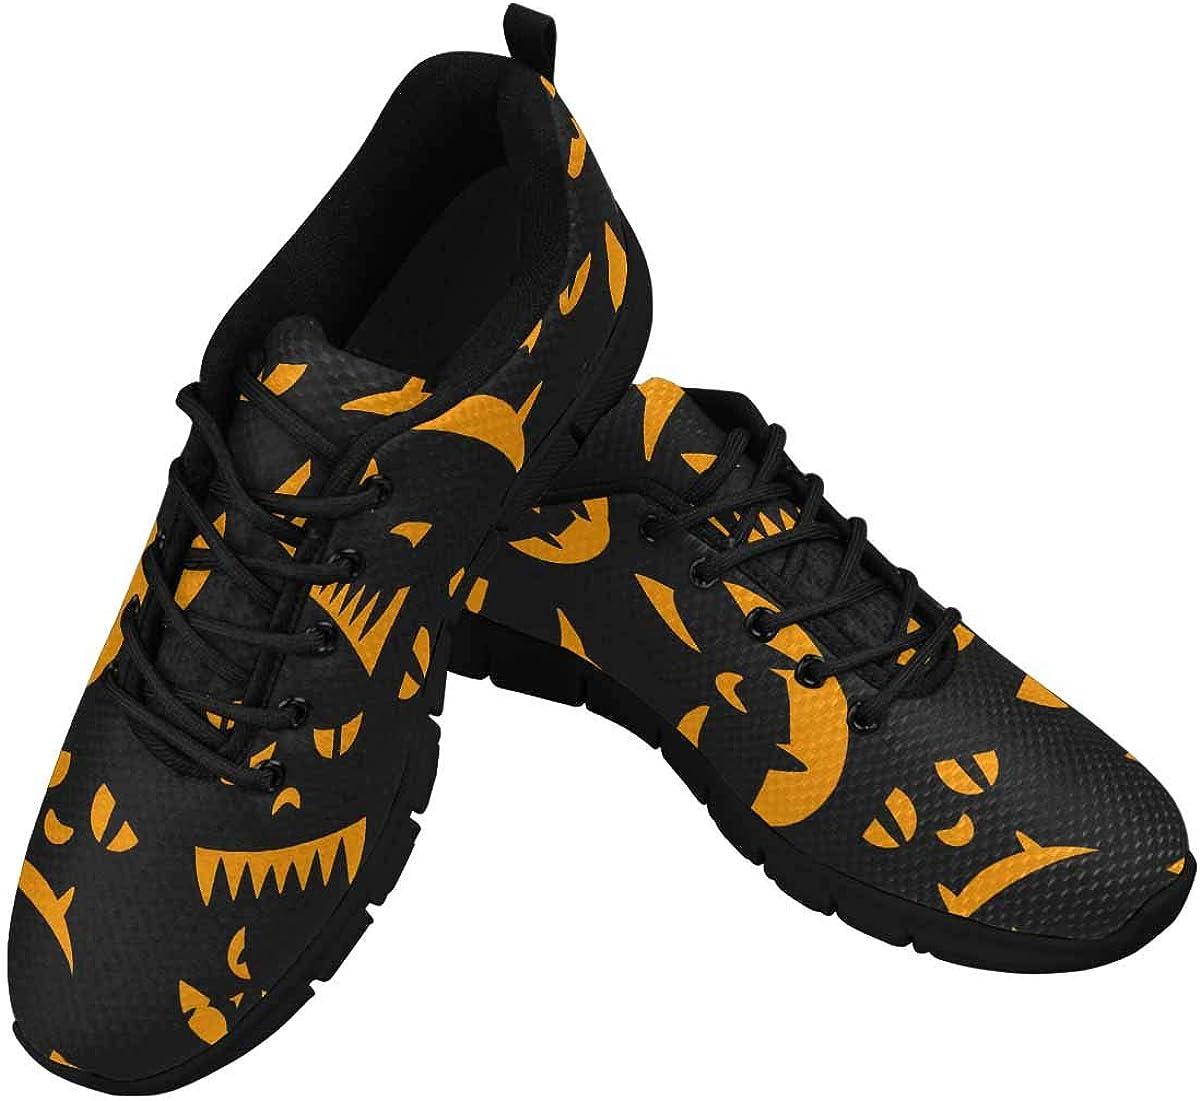 INTERESTPRINT Halloween Ghost Face Women's Athletic Walking Shoes Comfort Mesh Non Slip